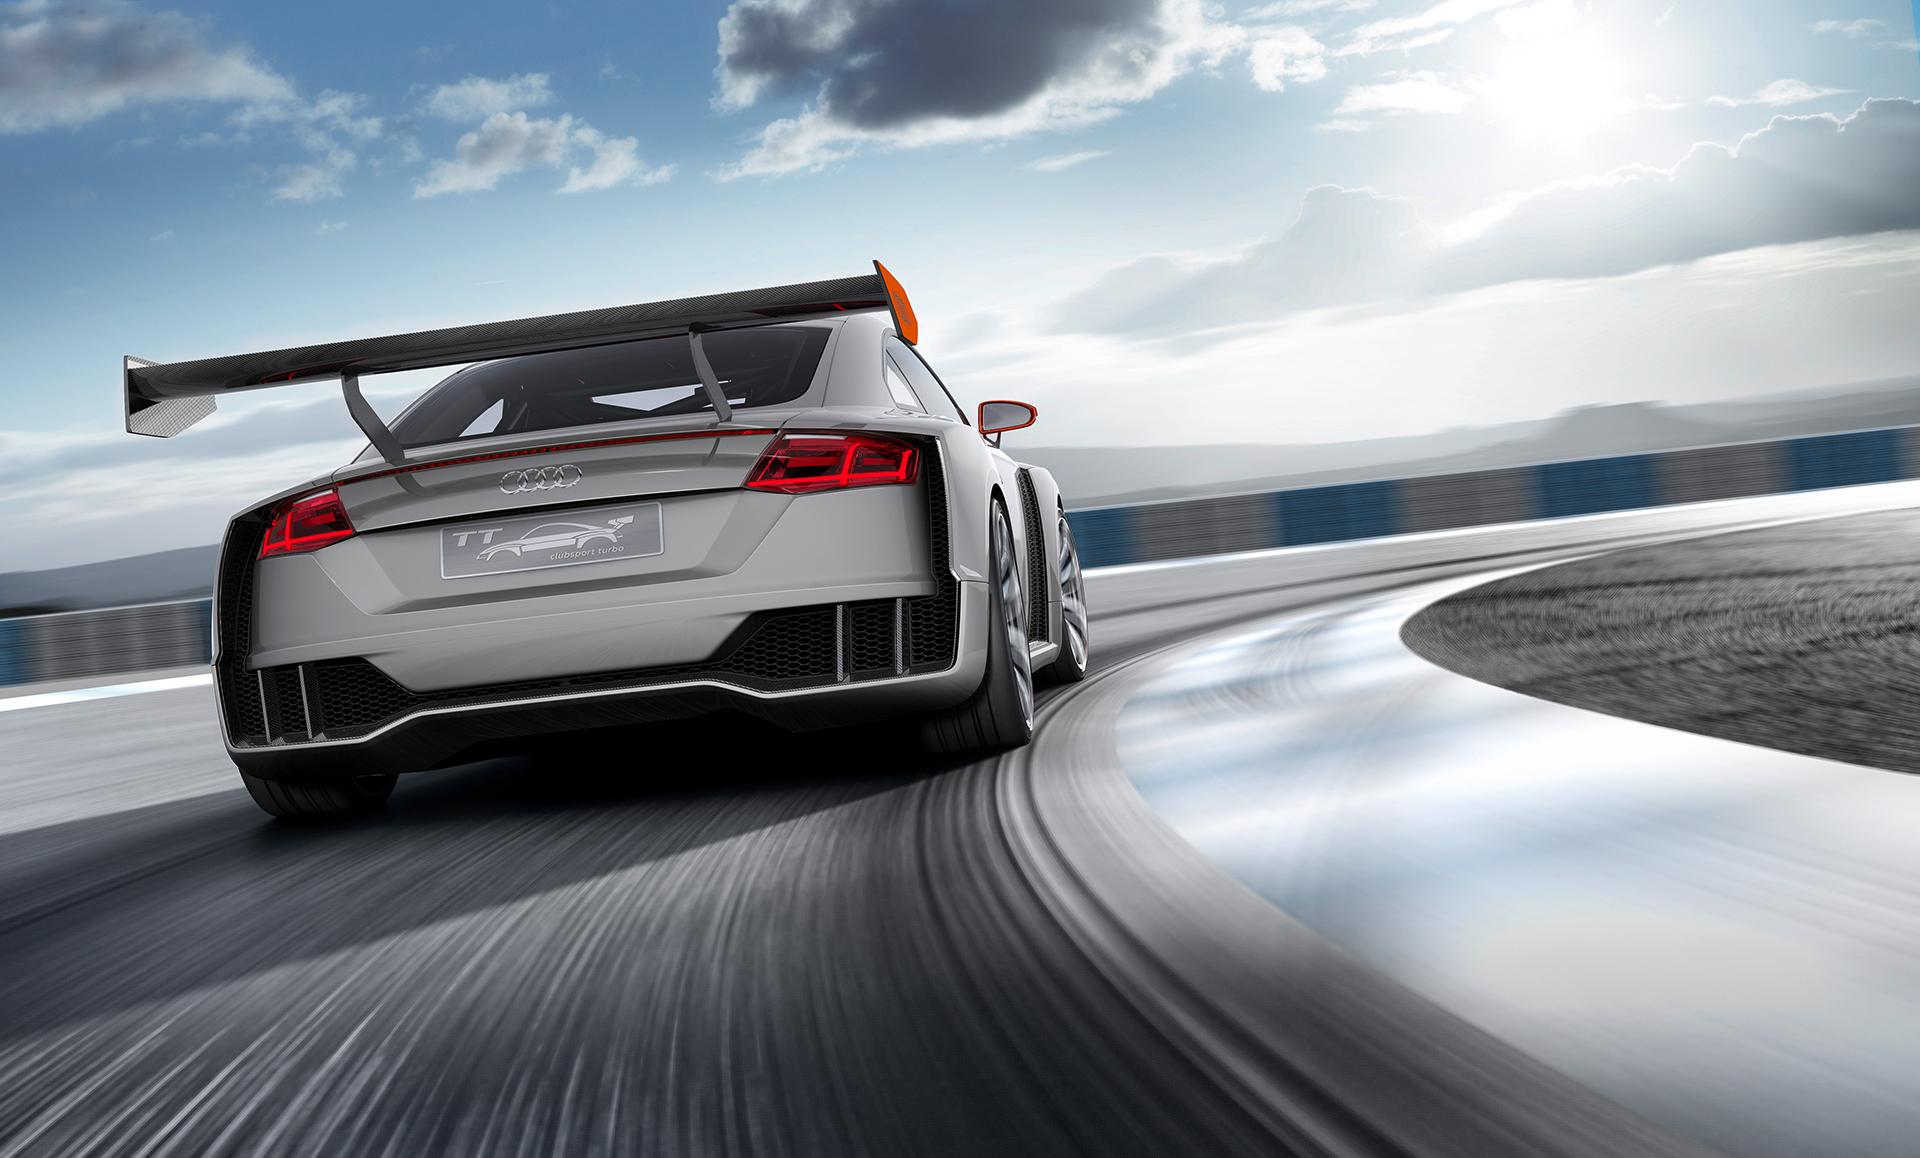 Audi TT clubsport turbo concept - rear wing / aileron arrière